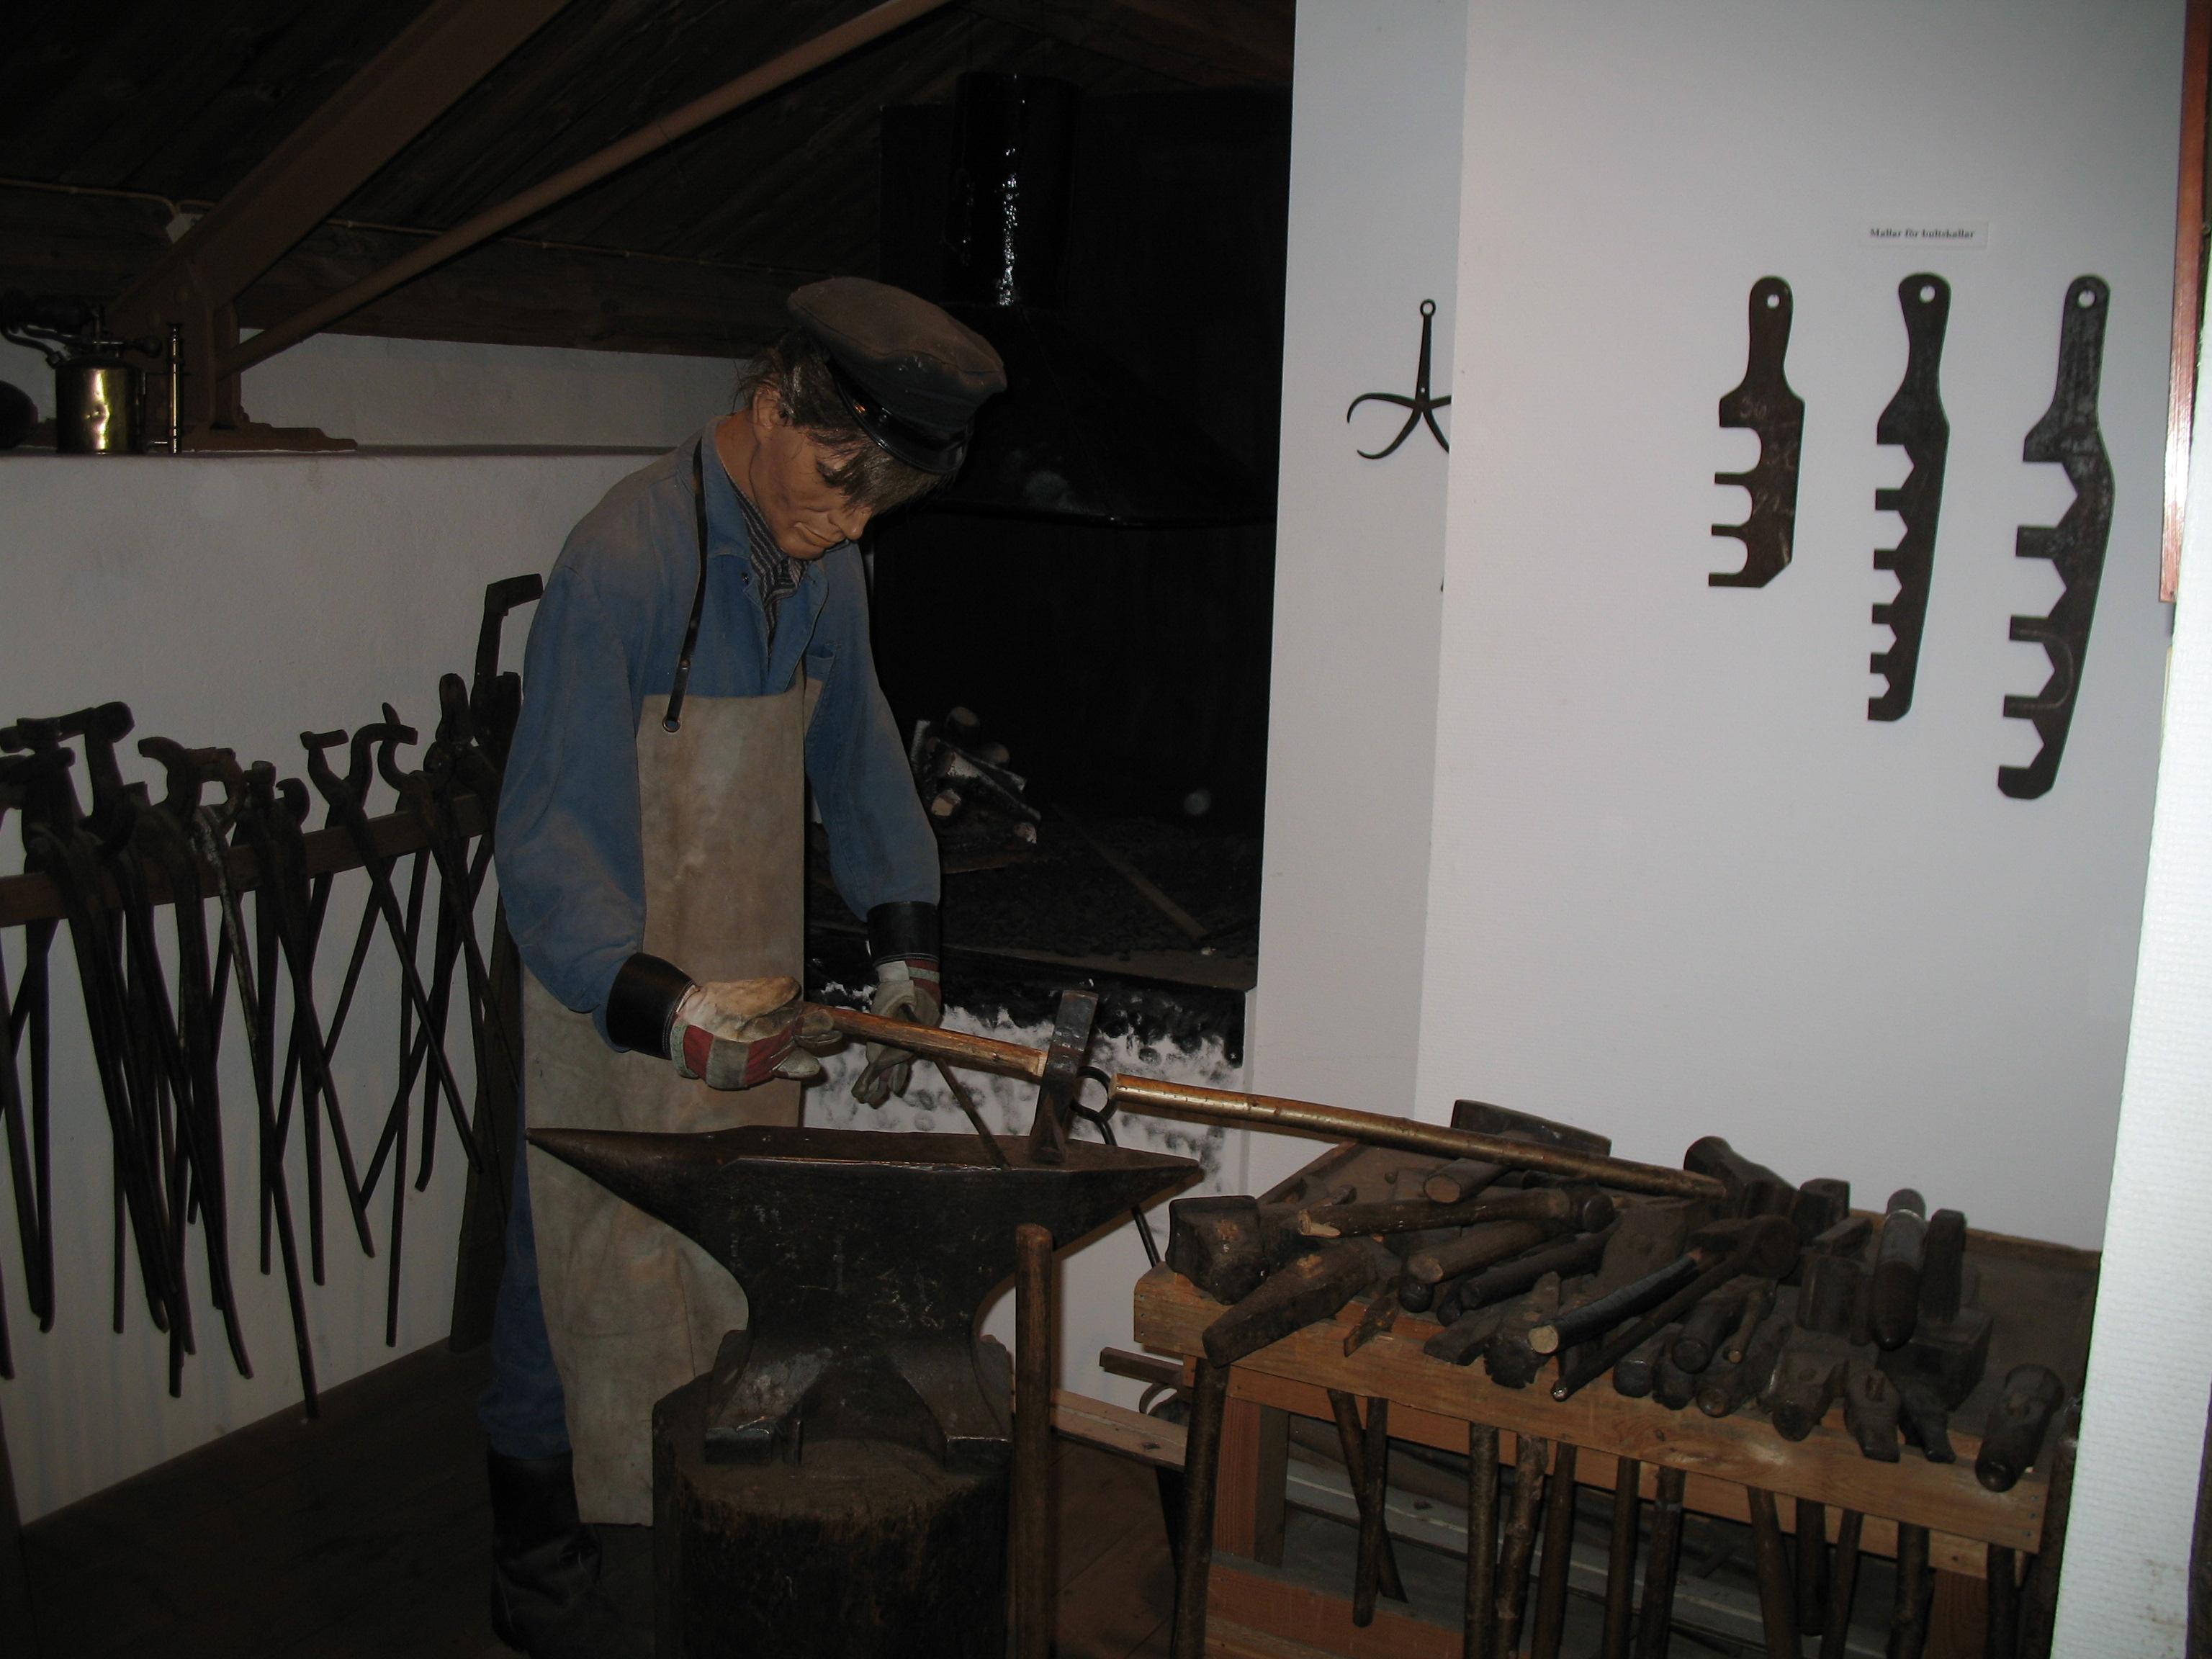 2006 Trollhättan - 43